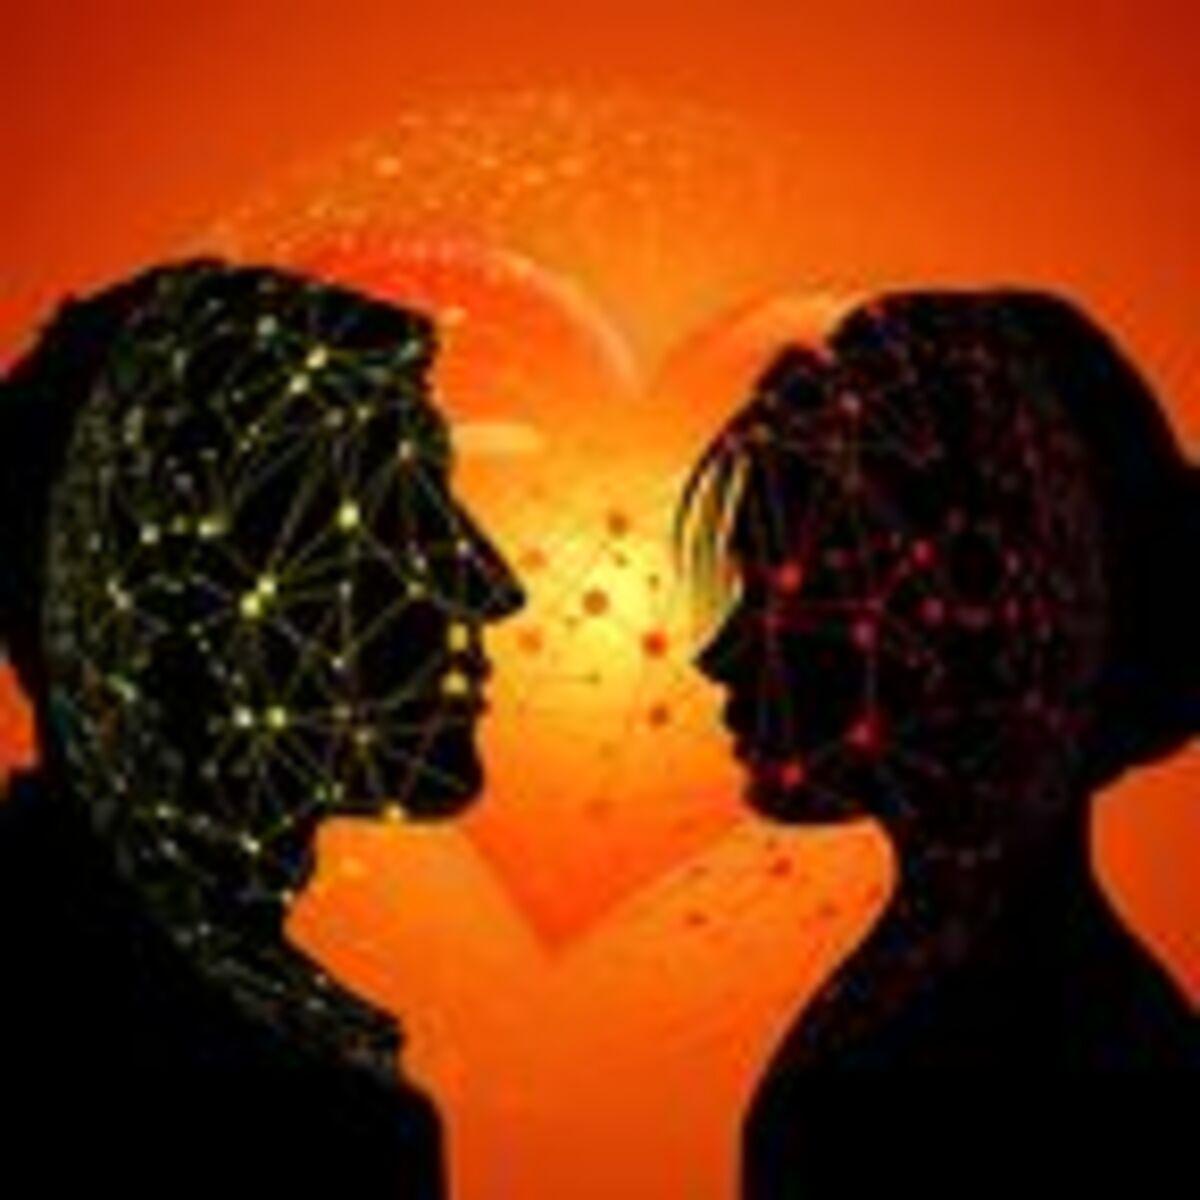 Speed dating swords - M.a.d. hook up